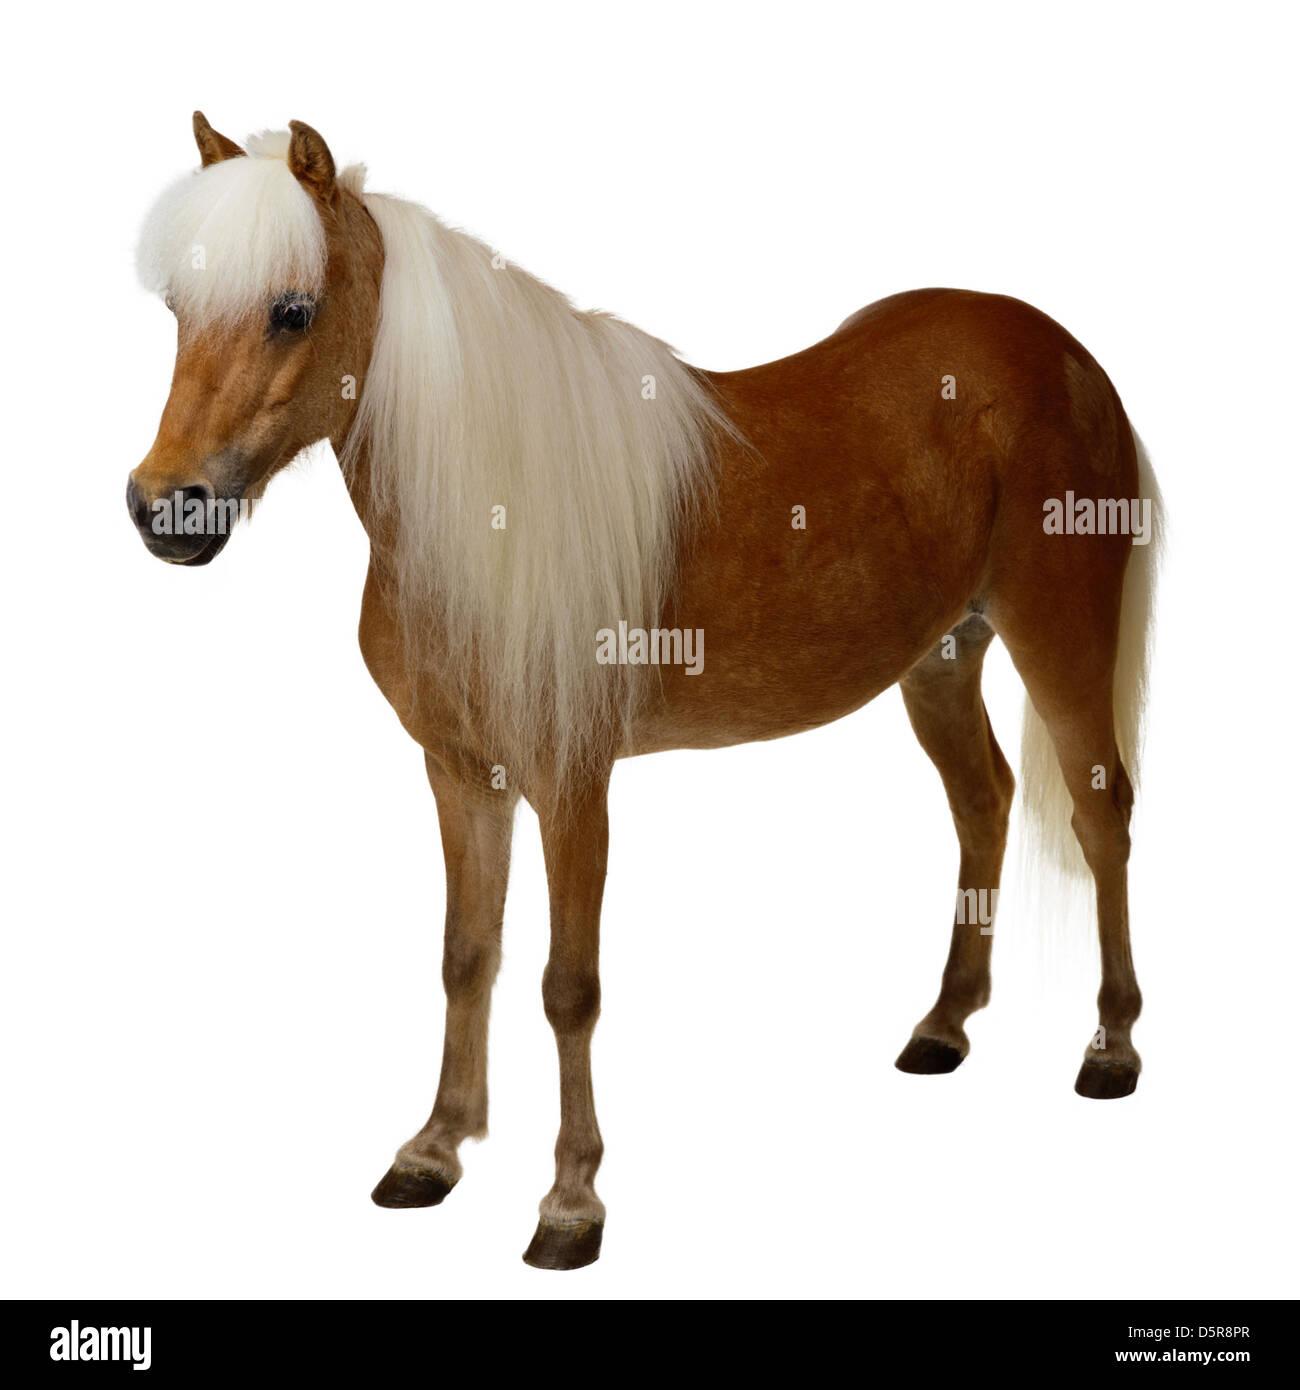 Horse isolated - Stock Image